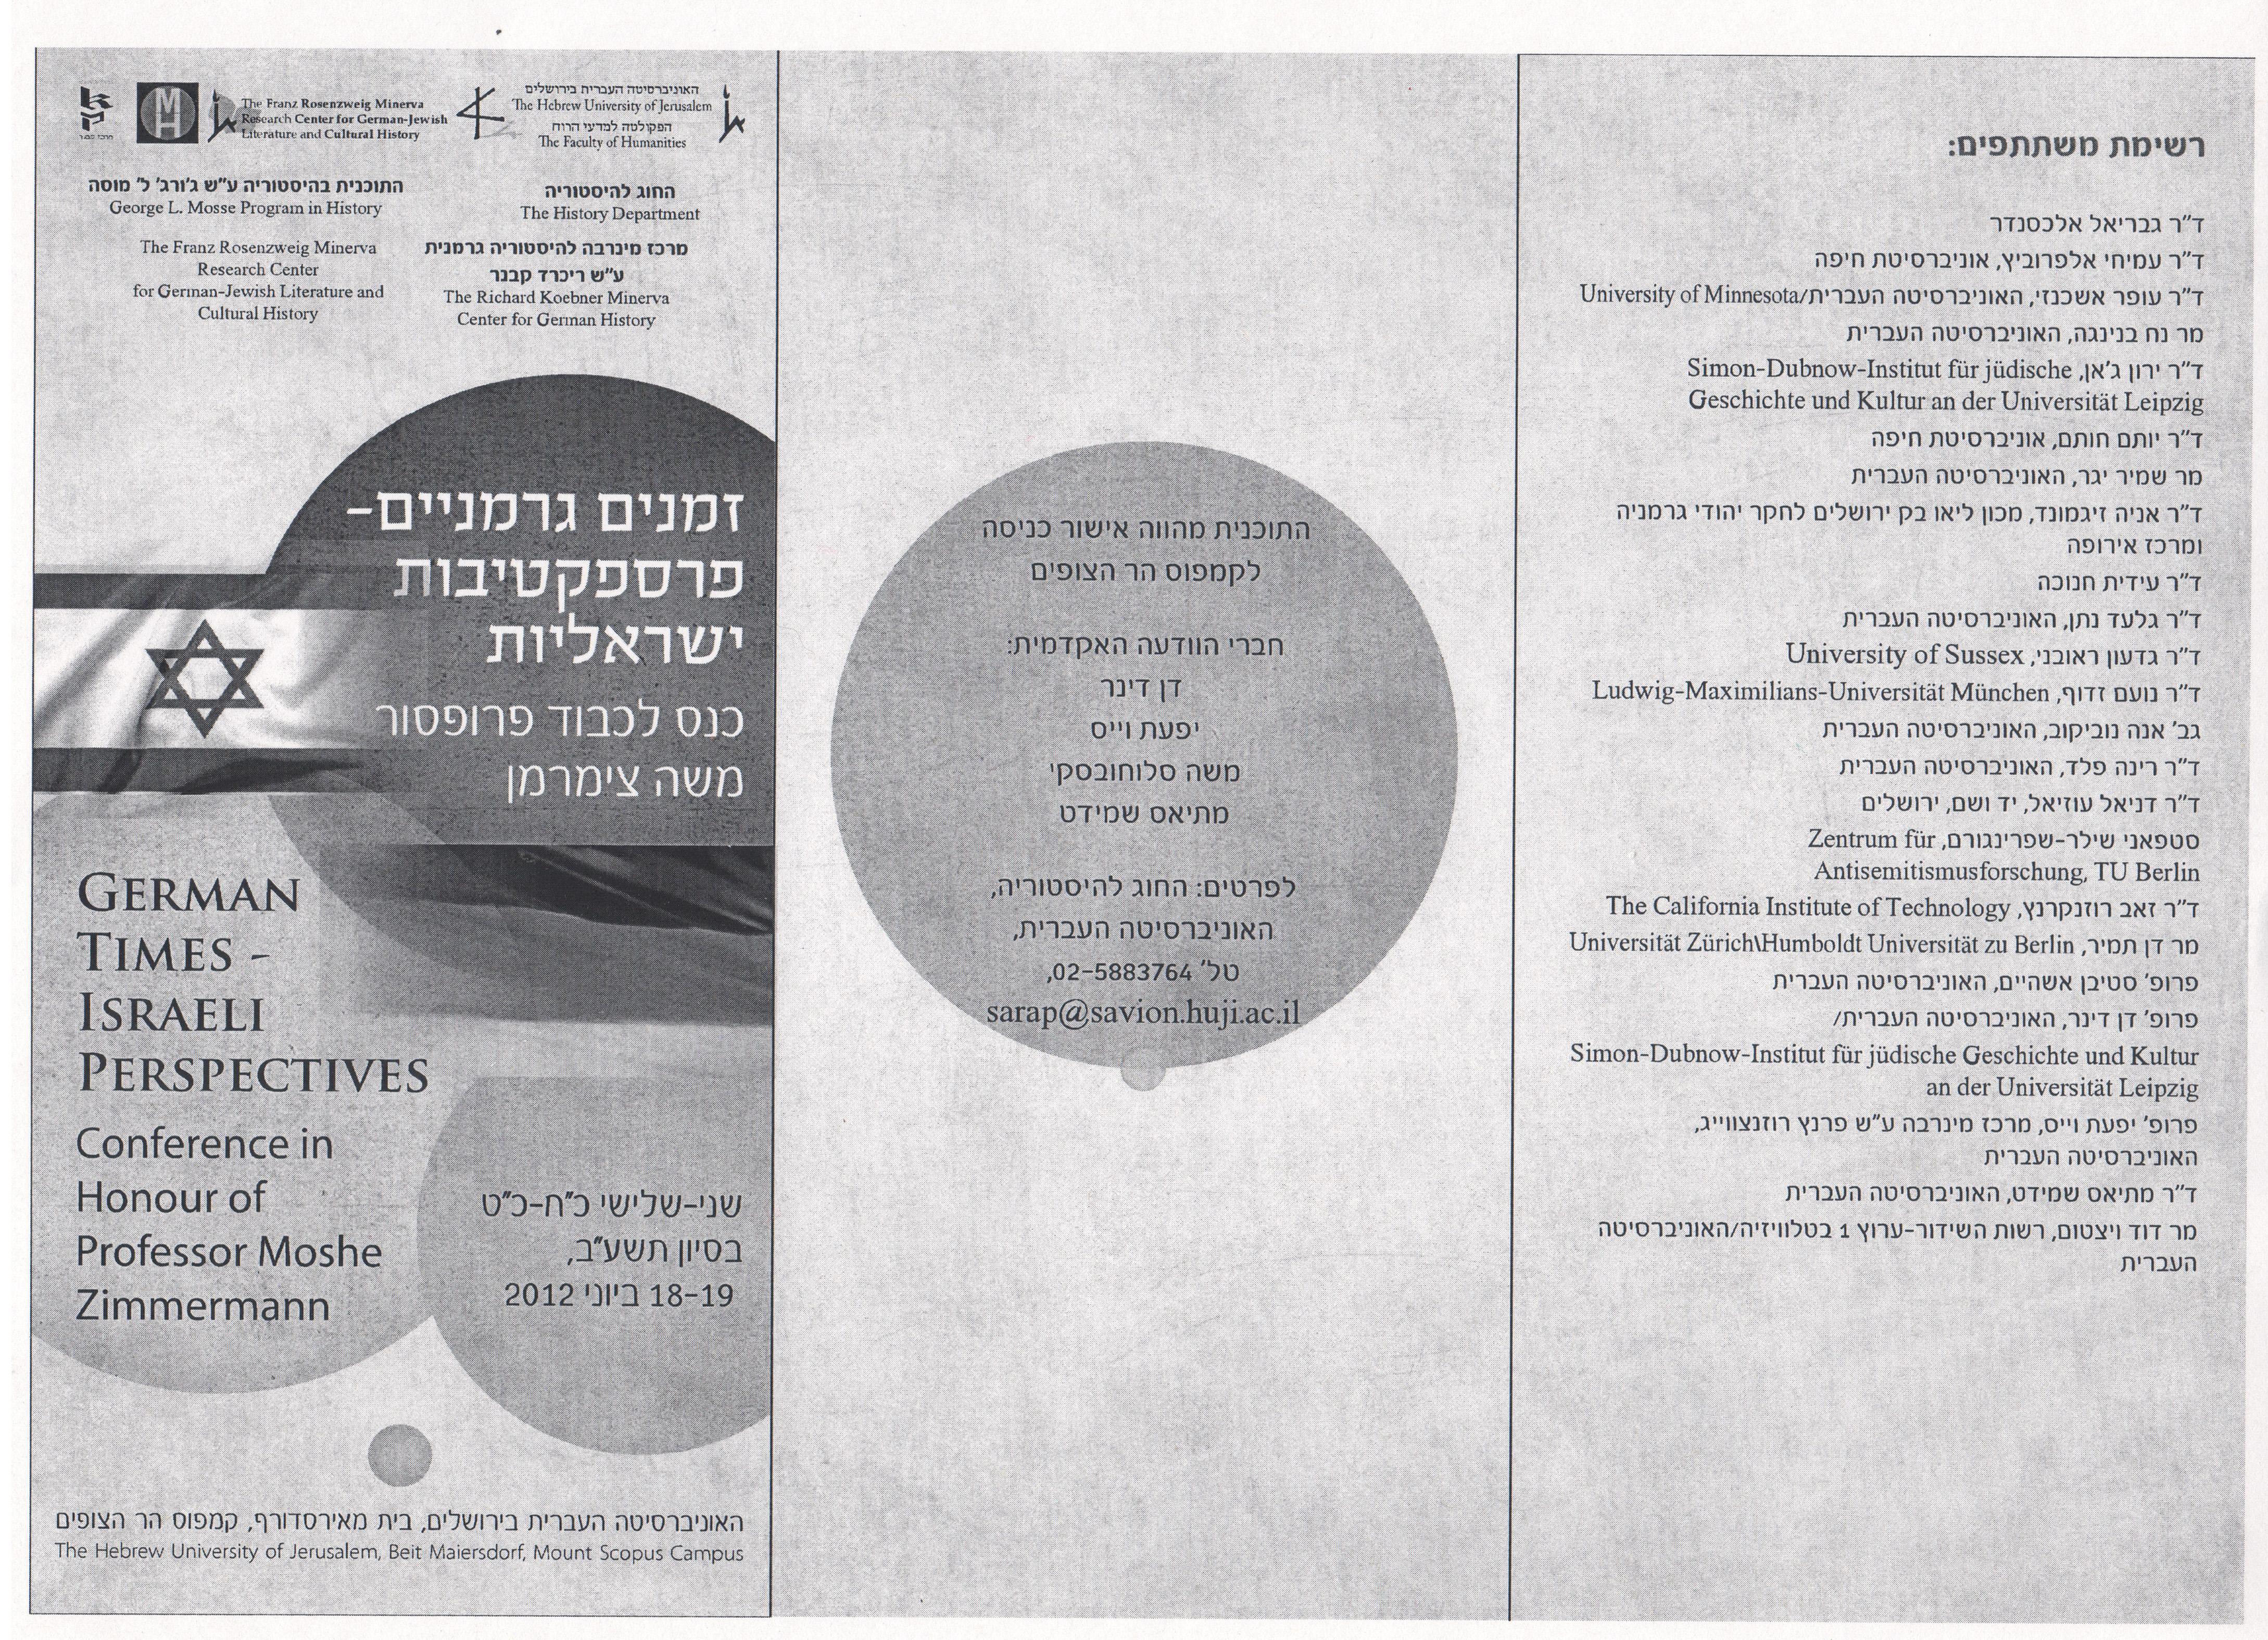 2012 - German Times-Israeli Perspectives Moshe Zimmermann Conference